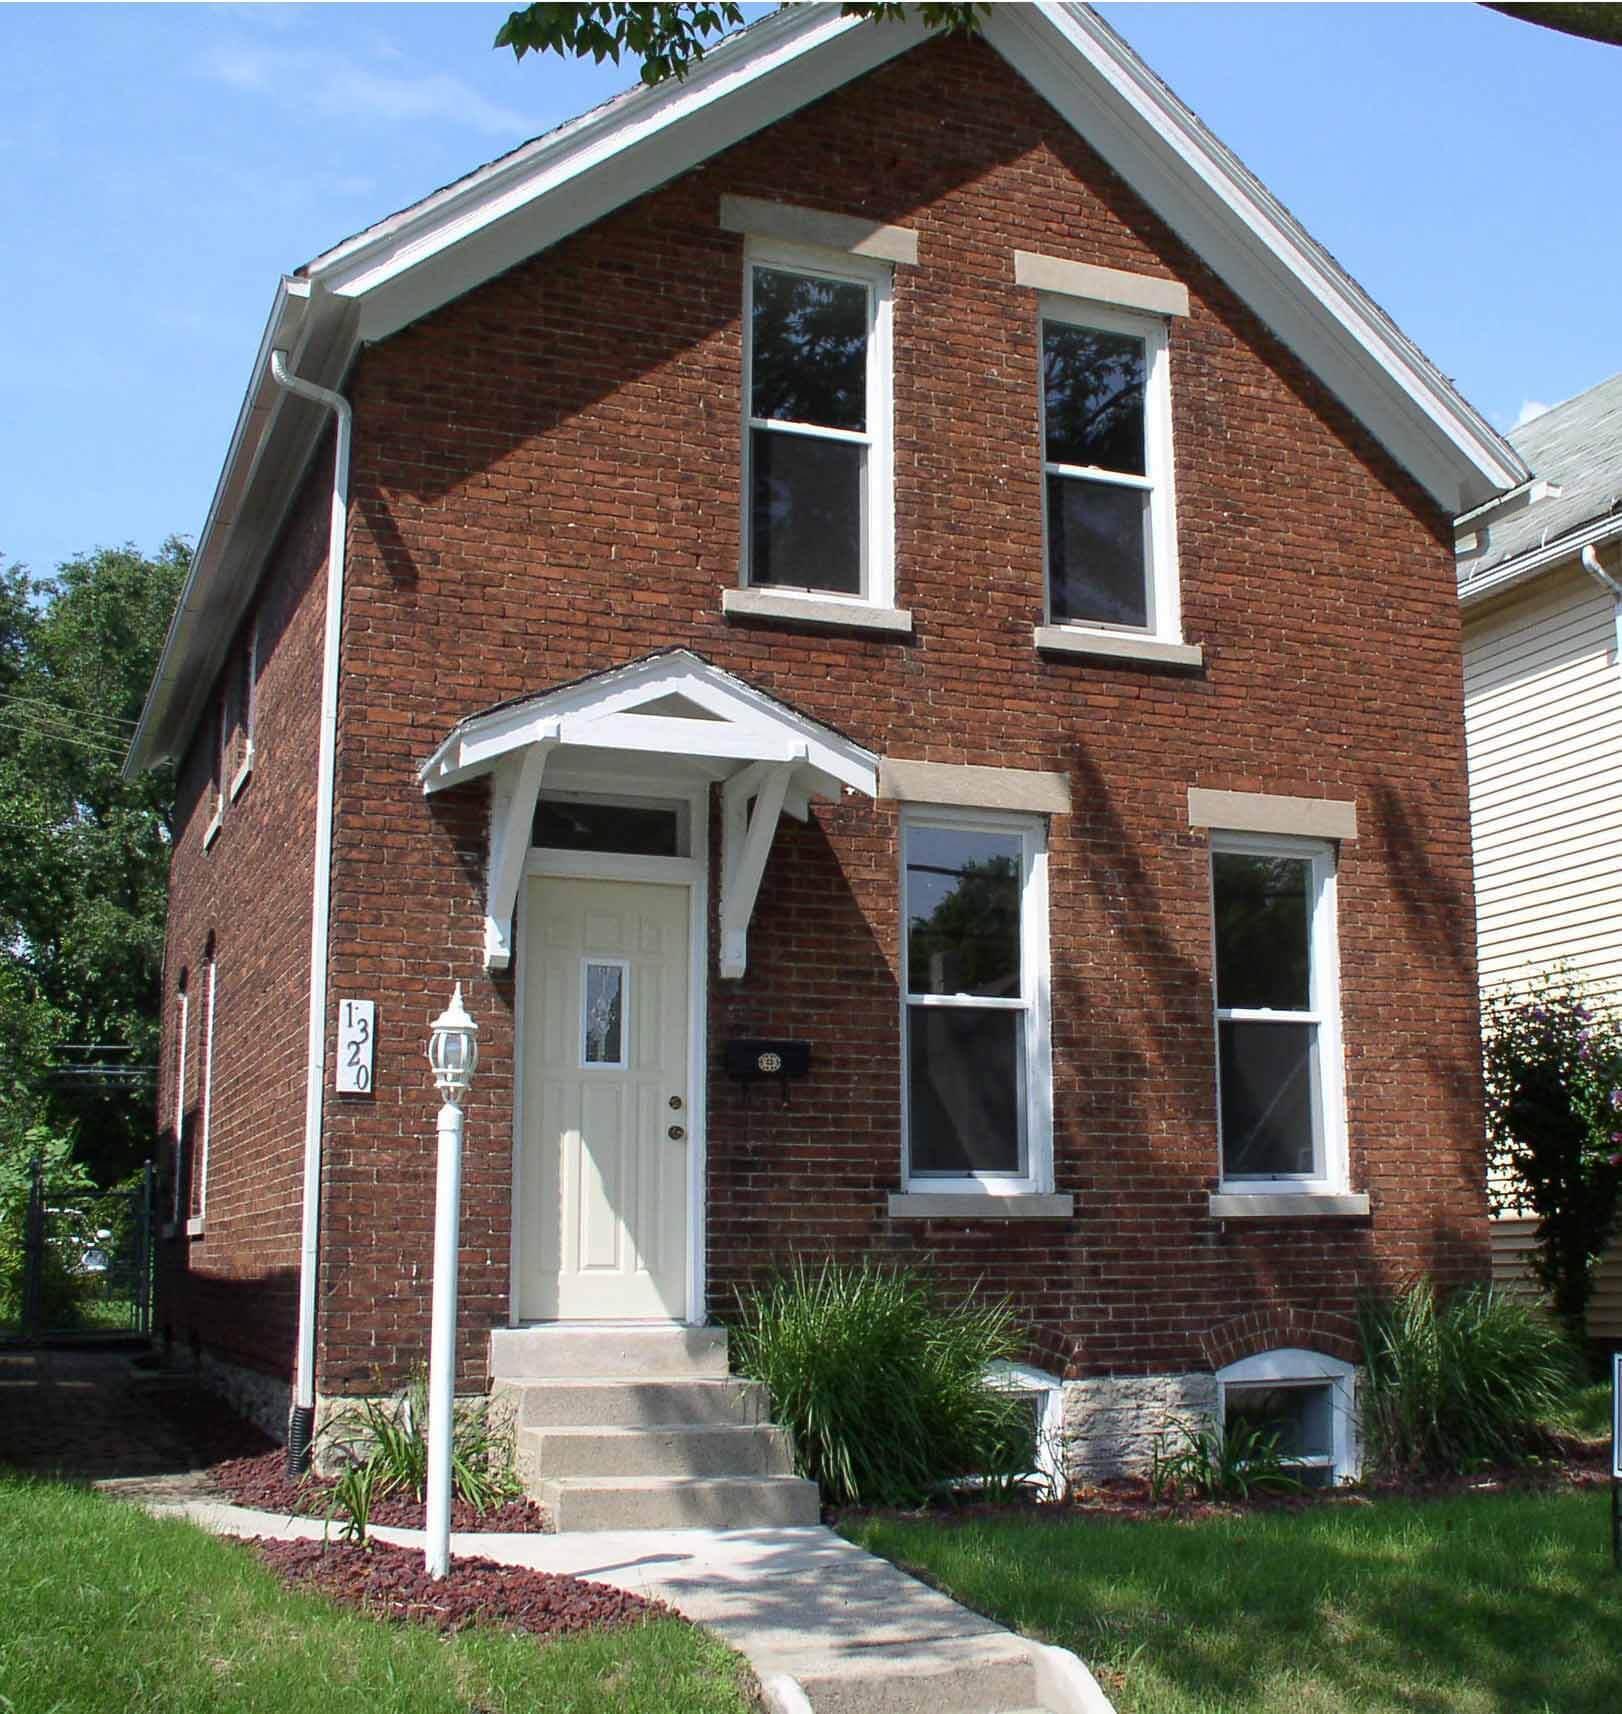 Jamestown Apartments Fort Wayne Floor Plans: Solid Brick 2 Or 3 Bed Fort Wayne Home W/ Daylight